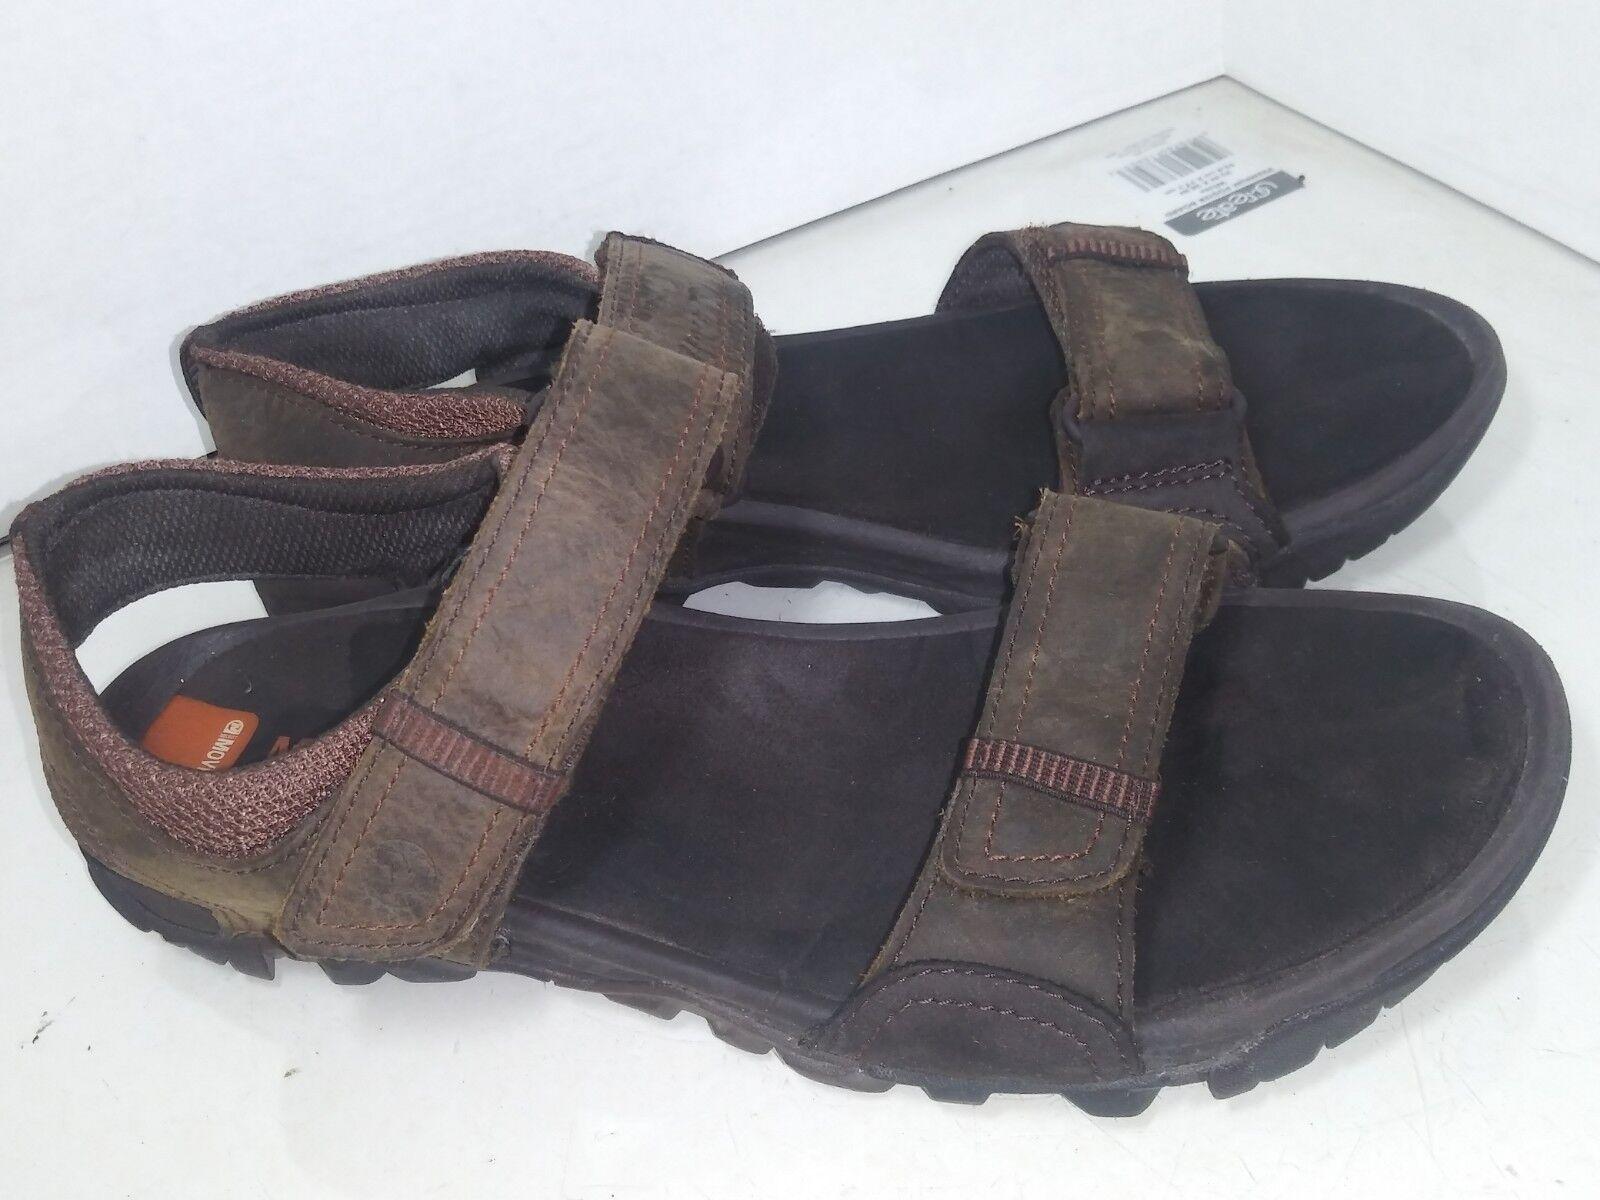 Merrell Telluride Strap Men's Sandal J71099 Claymens Size 10